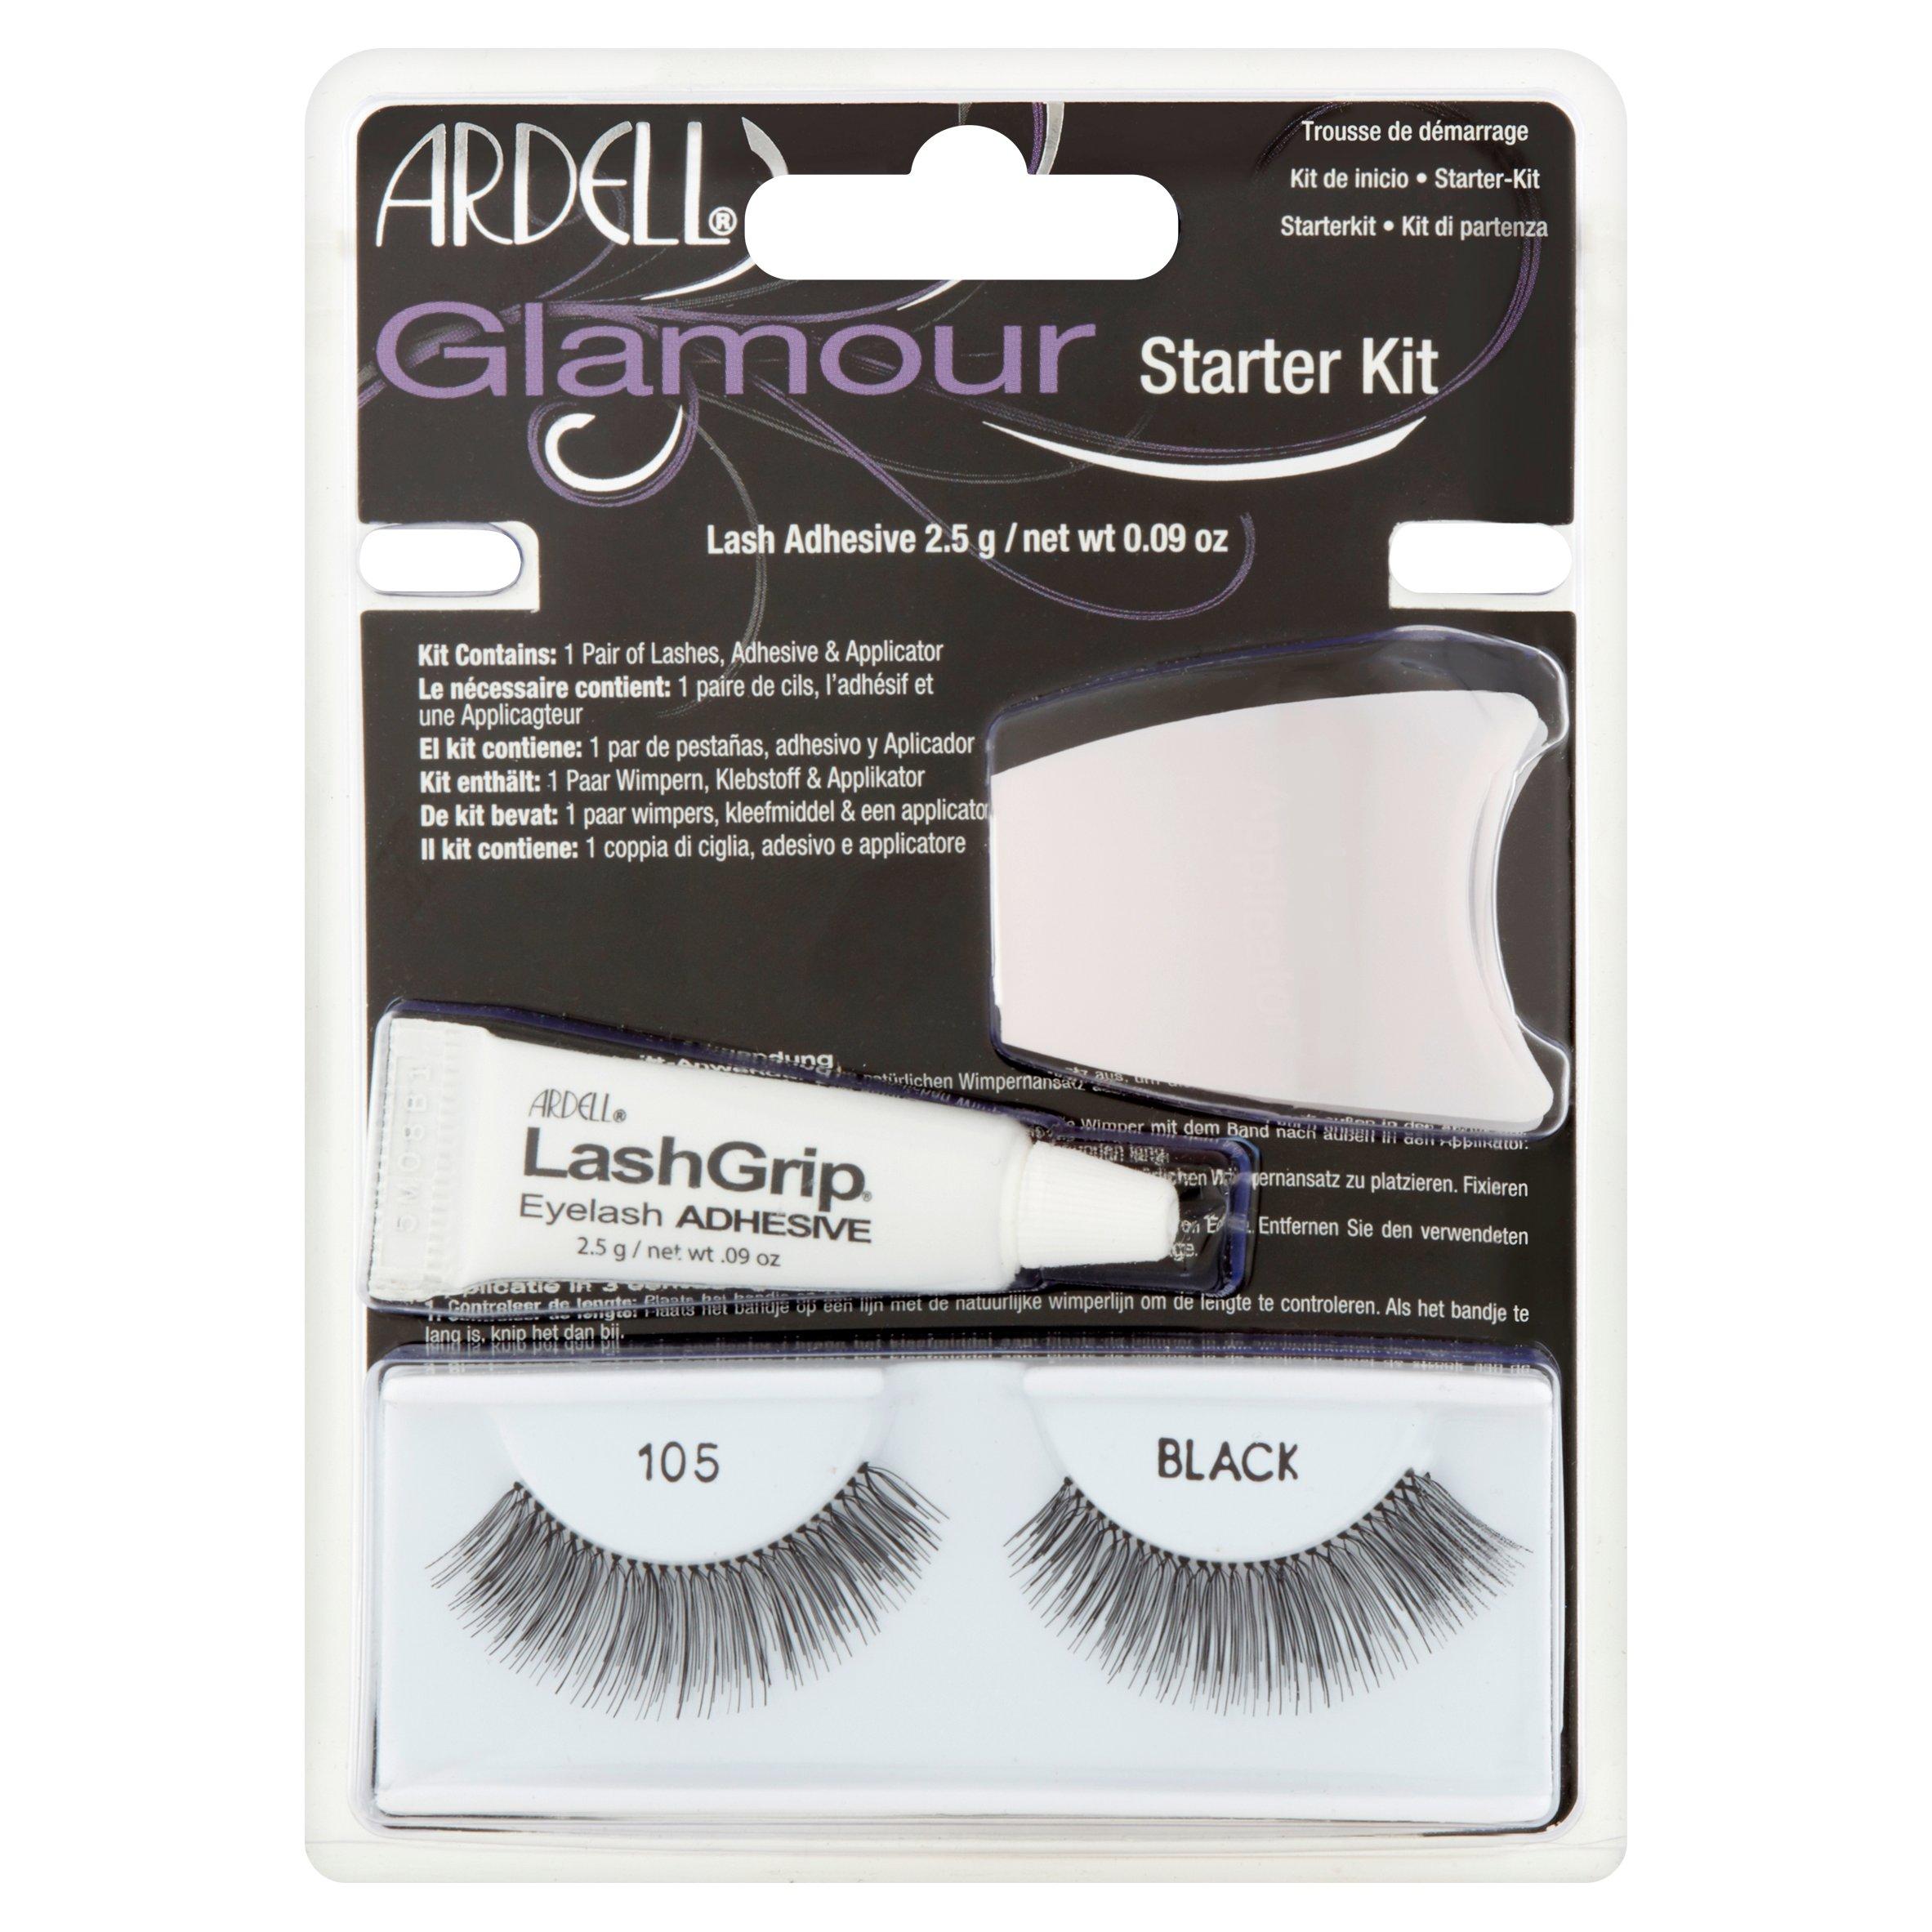 Ardell Glamour Lash Adhesive Starter Kit